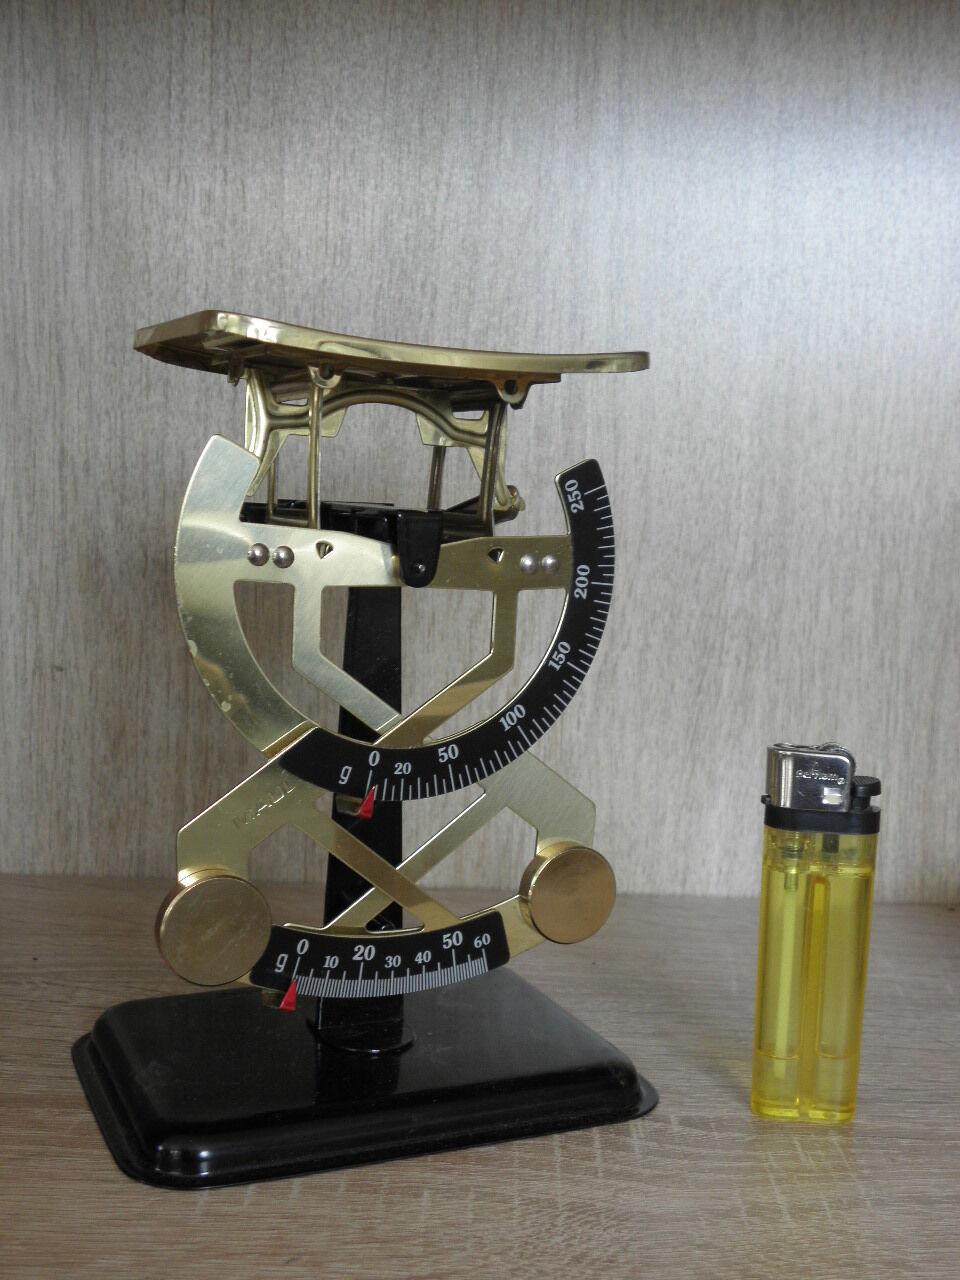 Art deco old desk LETTER SCALES vintage Brass scale Letter bauhaus balance